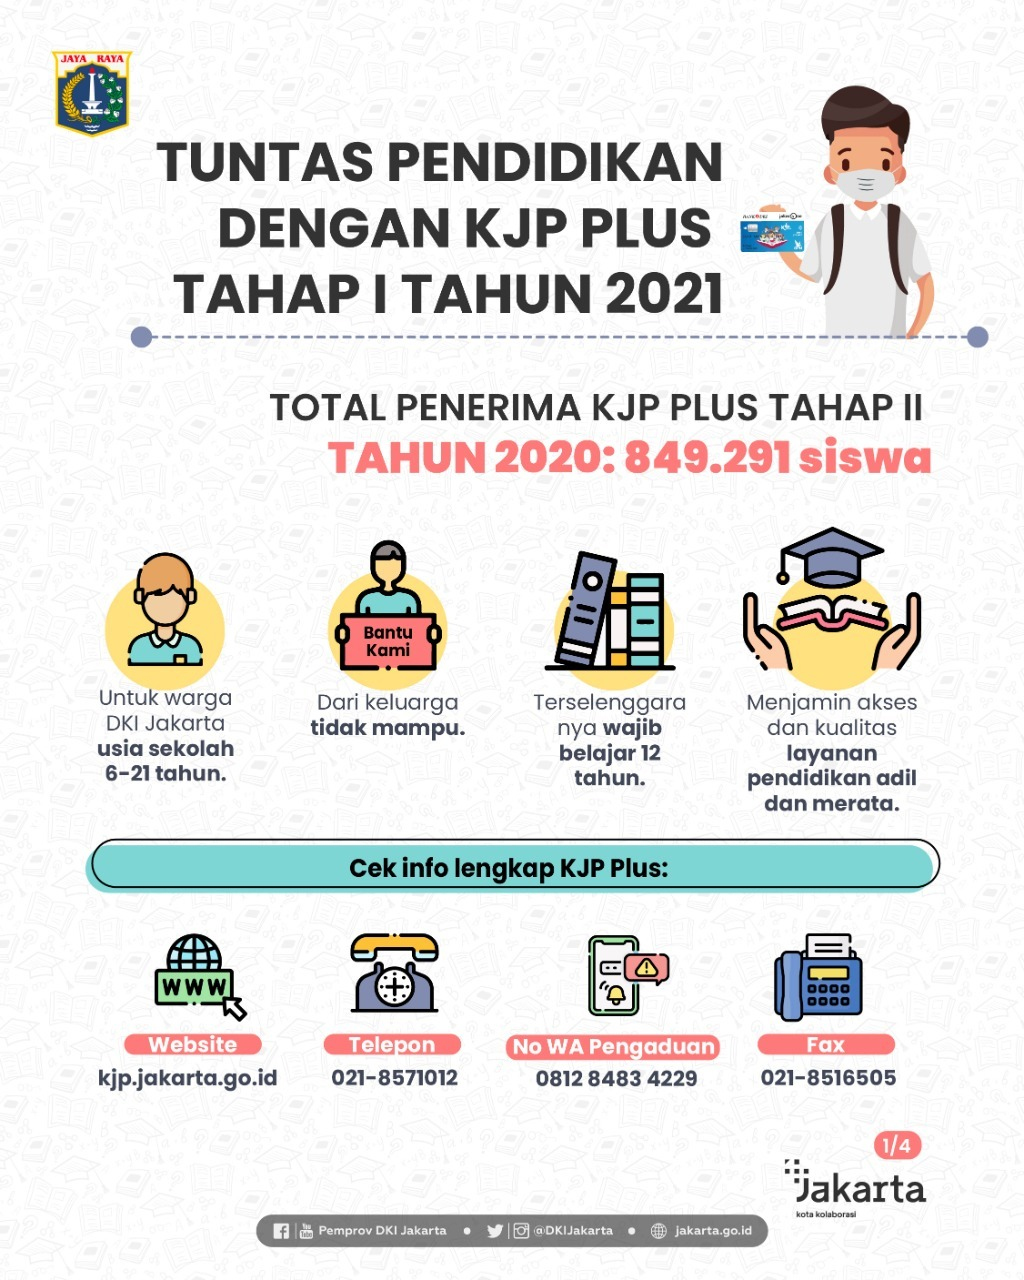 Tuntas Pendidikan Dengan KJP Plus Tahap 1 Tahun 2021-Slide_1